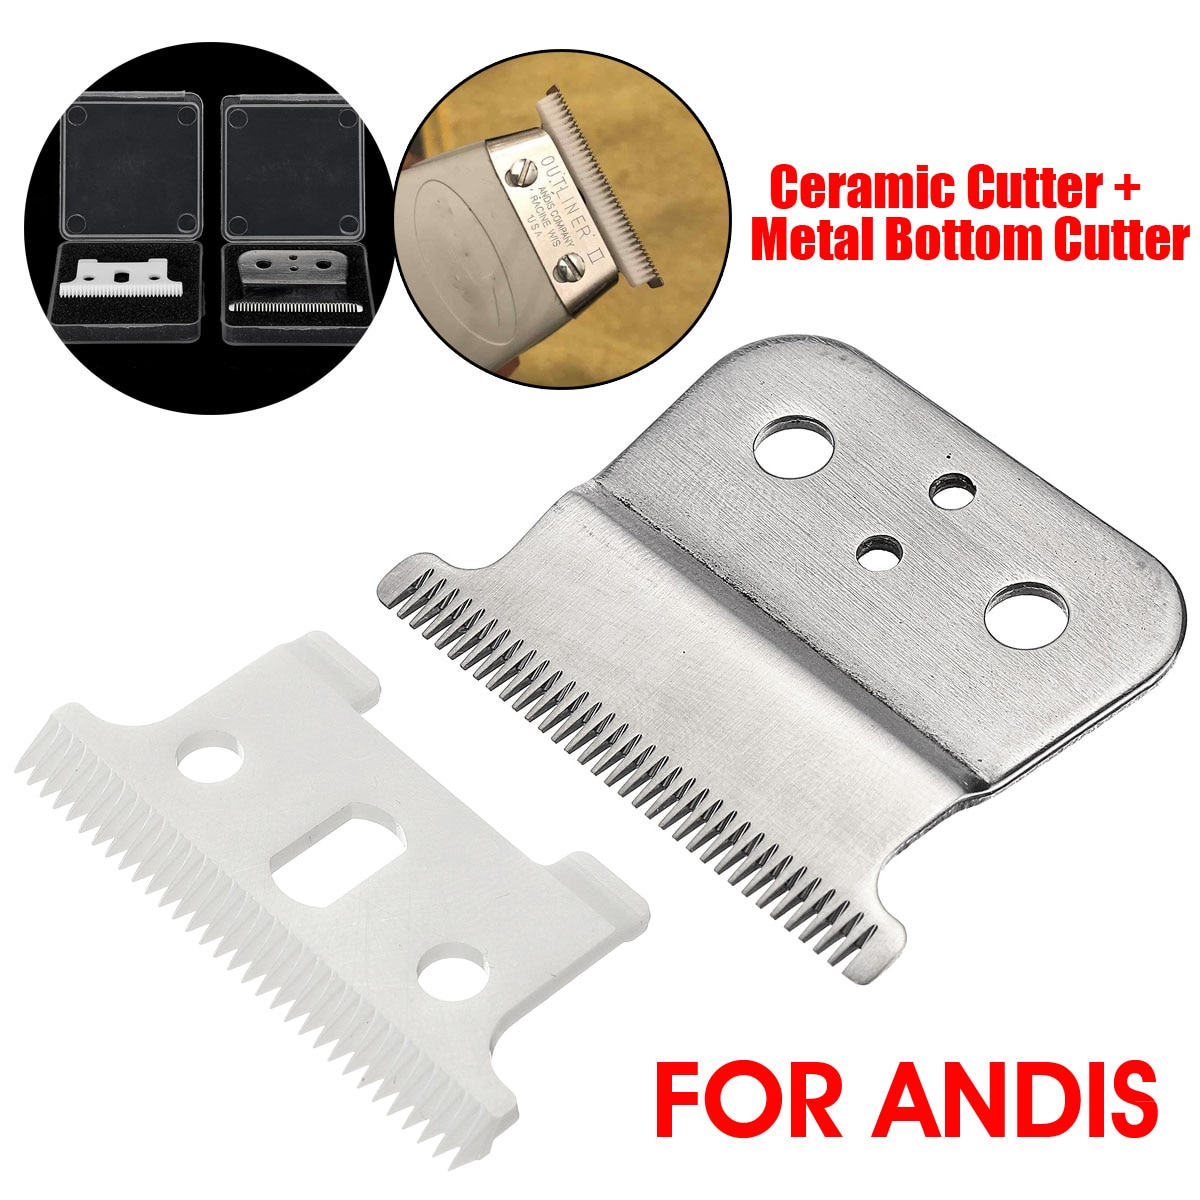 2 pcs cortador de ceramica metal inferior cortador para andis eletrica aparador cabelo